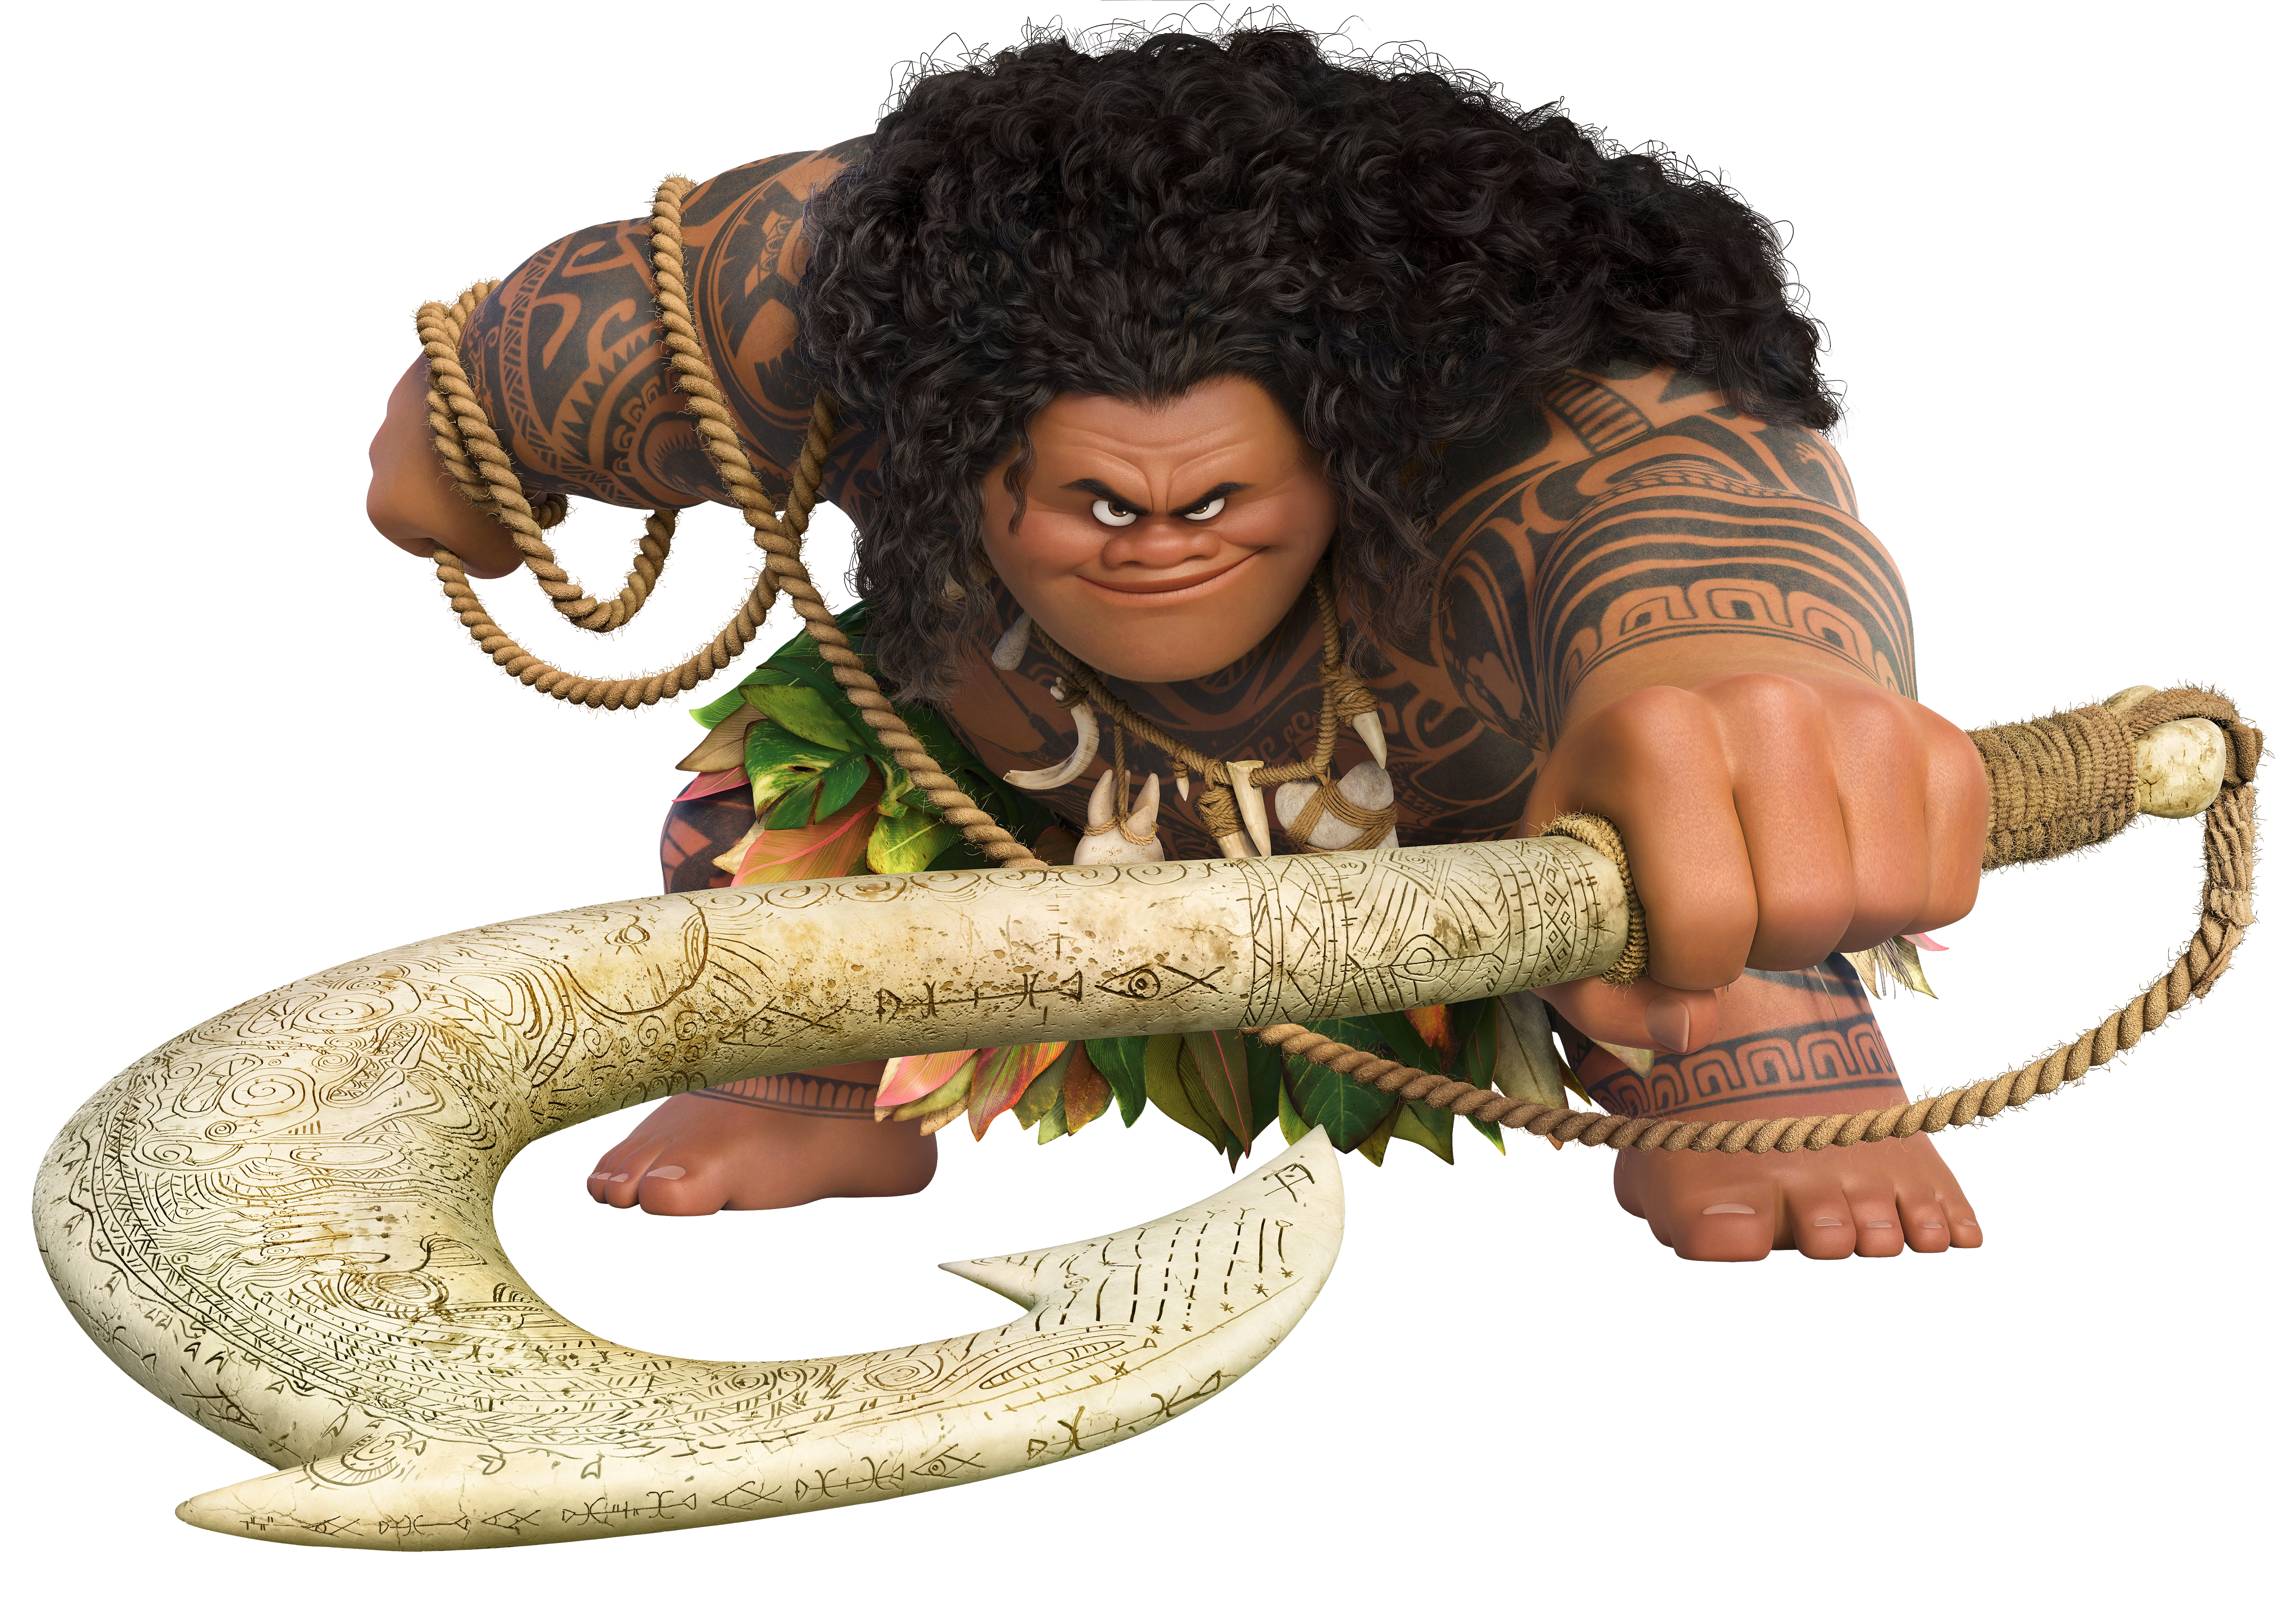 Disney school clipart jpg free stock Maui Moana Disney Large Transparent PNG Image | Gallery ... jpg free stock